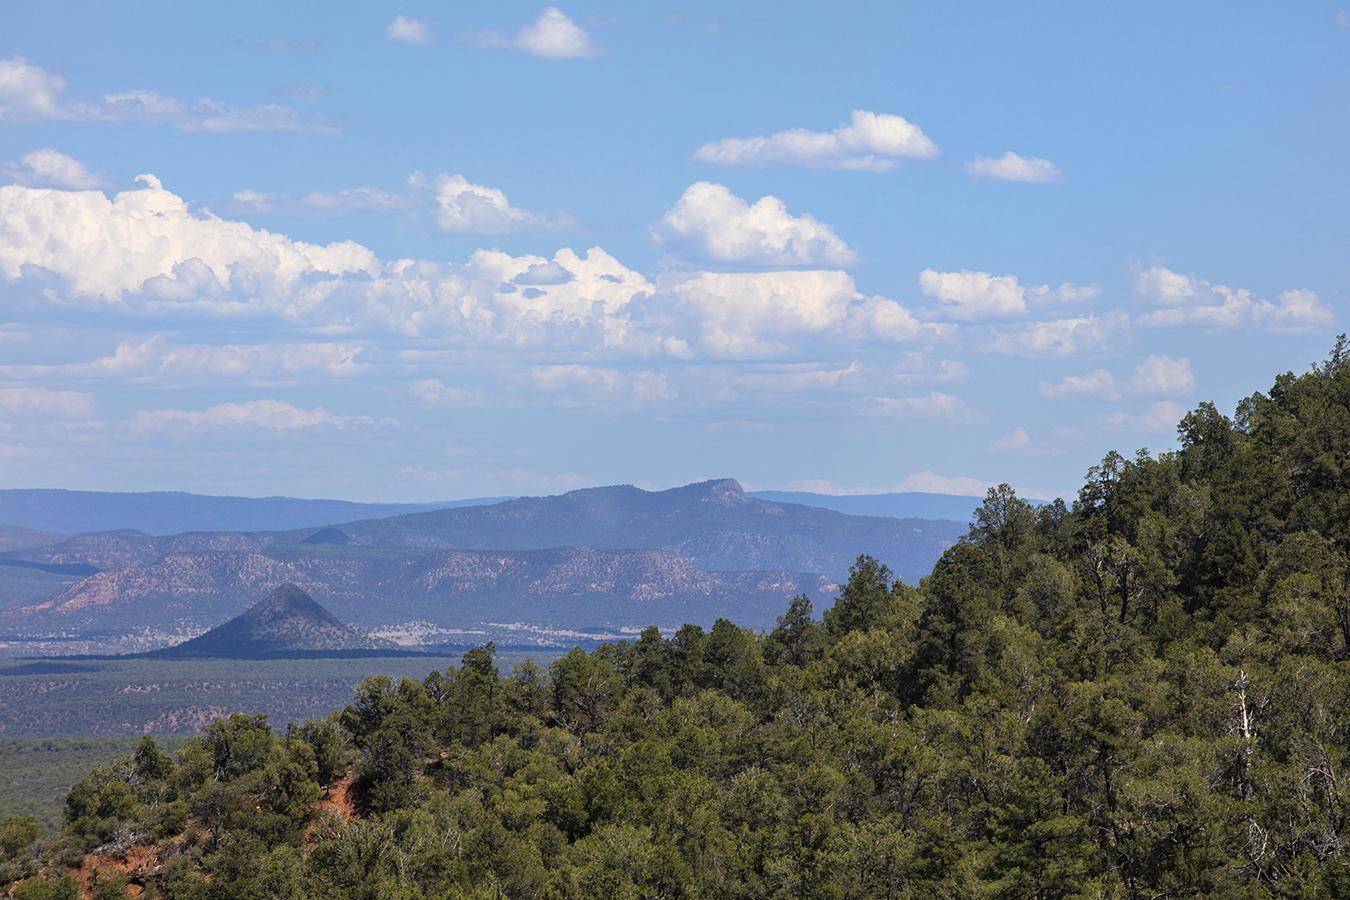 southwest landscape clouds desert mountains trees